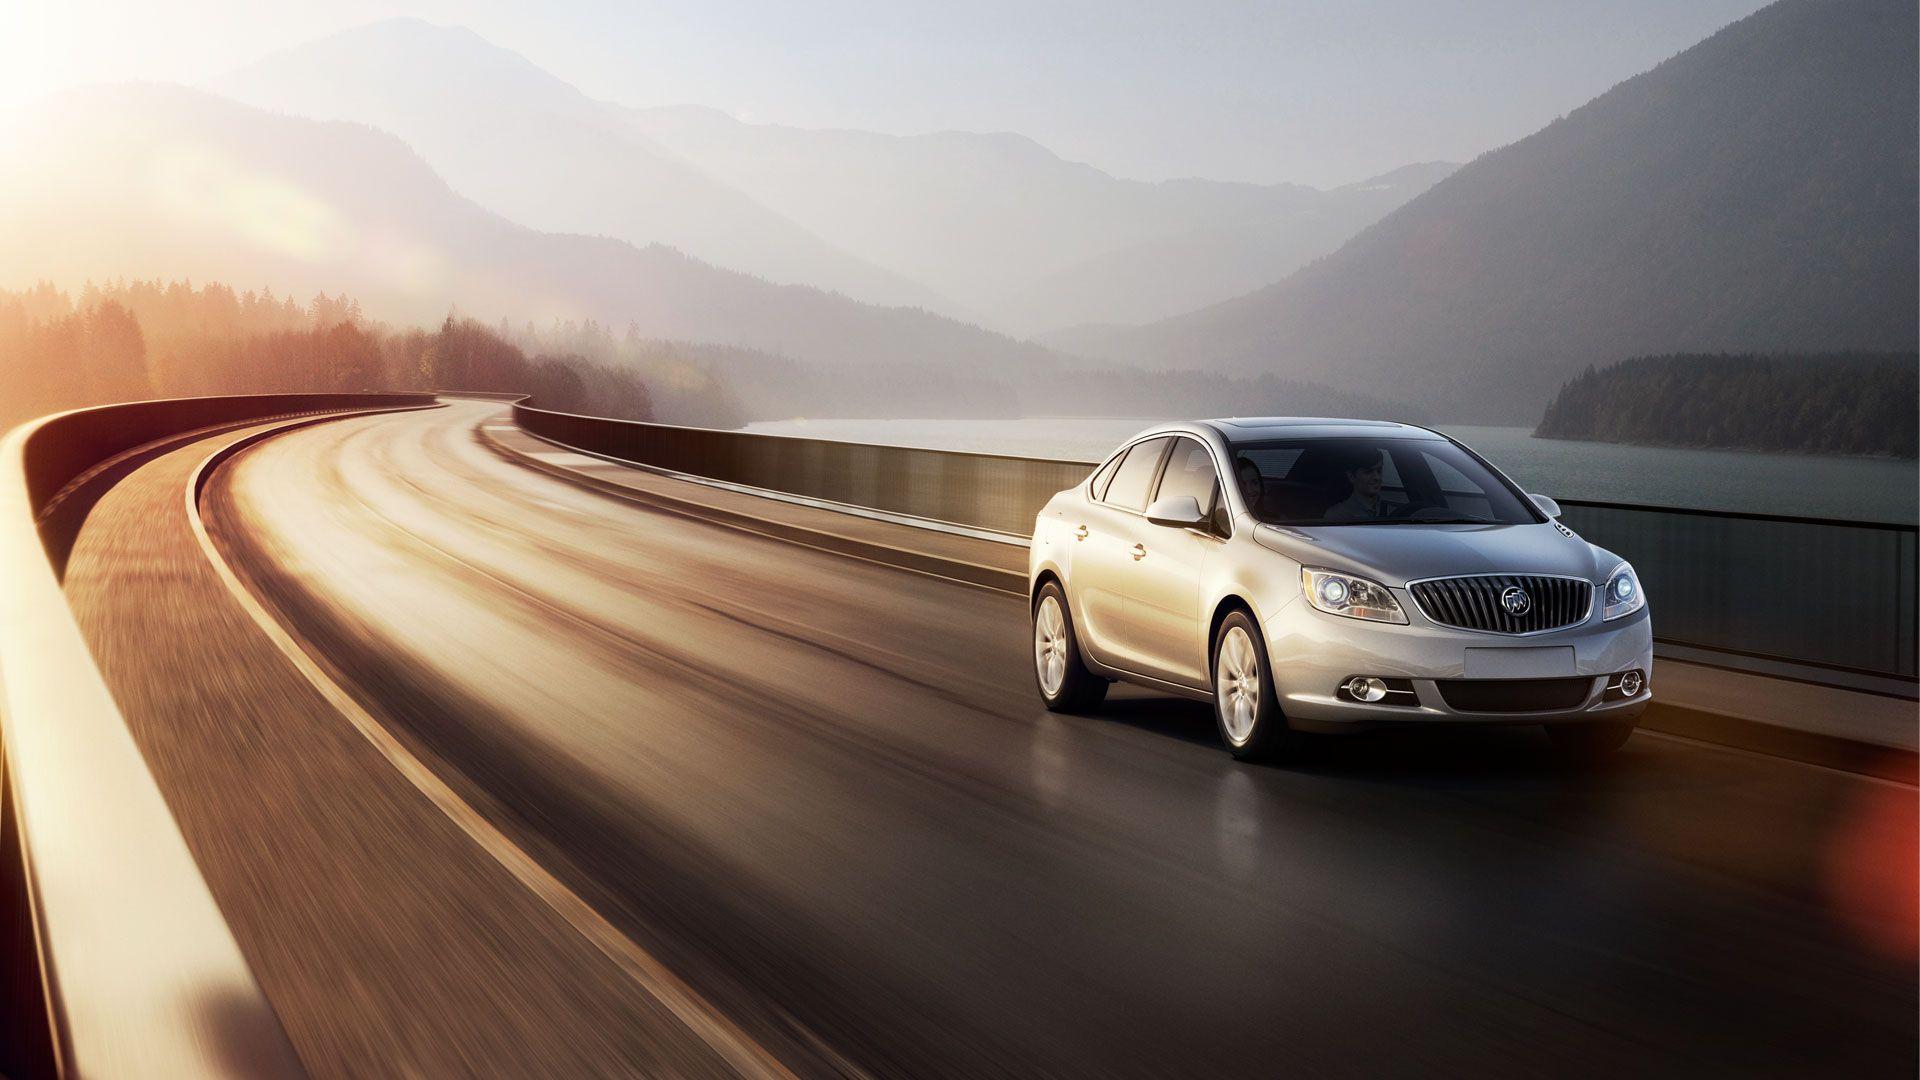 General Motors 2012 Buick Verano Buick